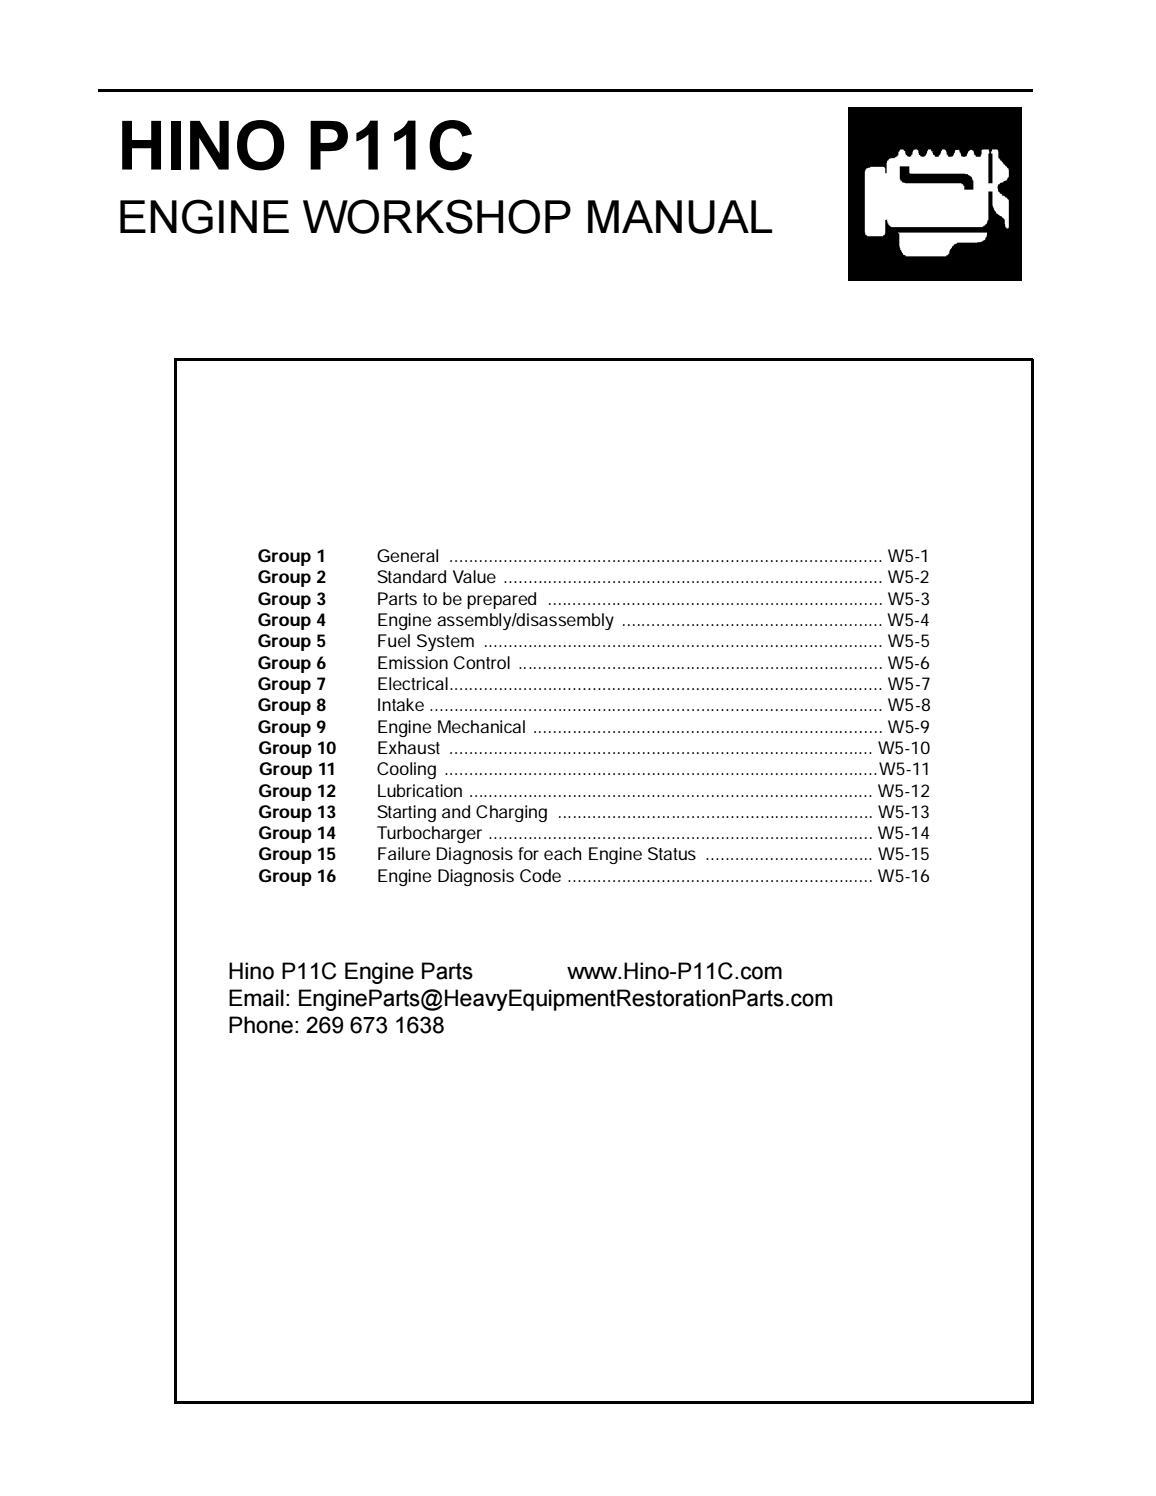 Hino P11c Engine Workshop Manual By Engineparts2 Issuu